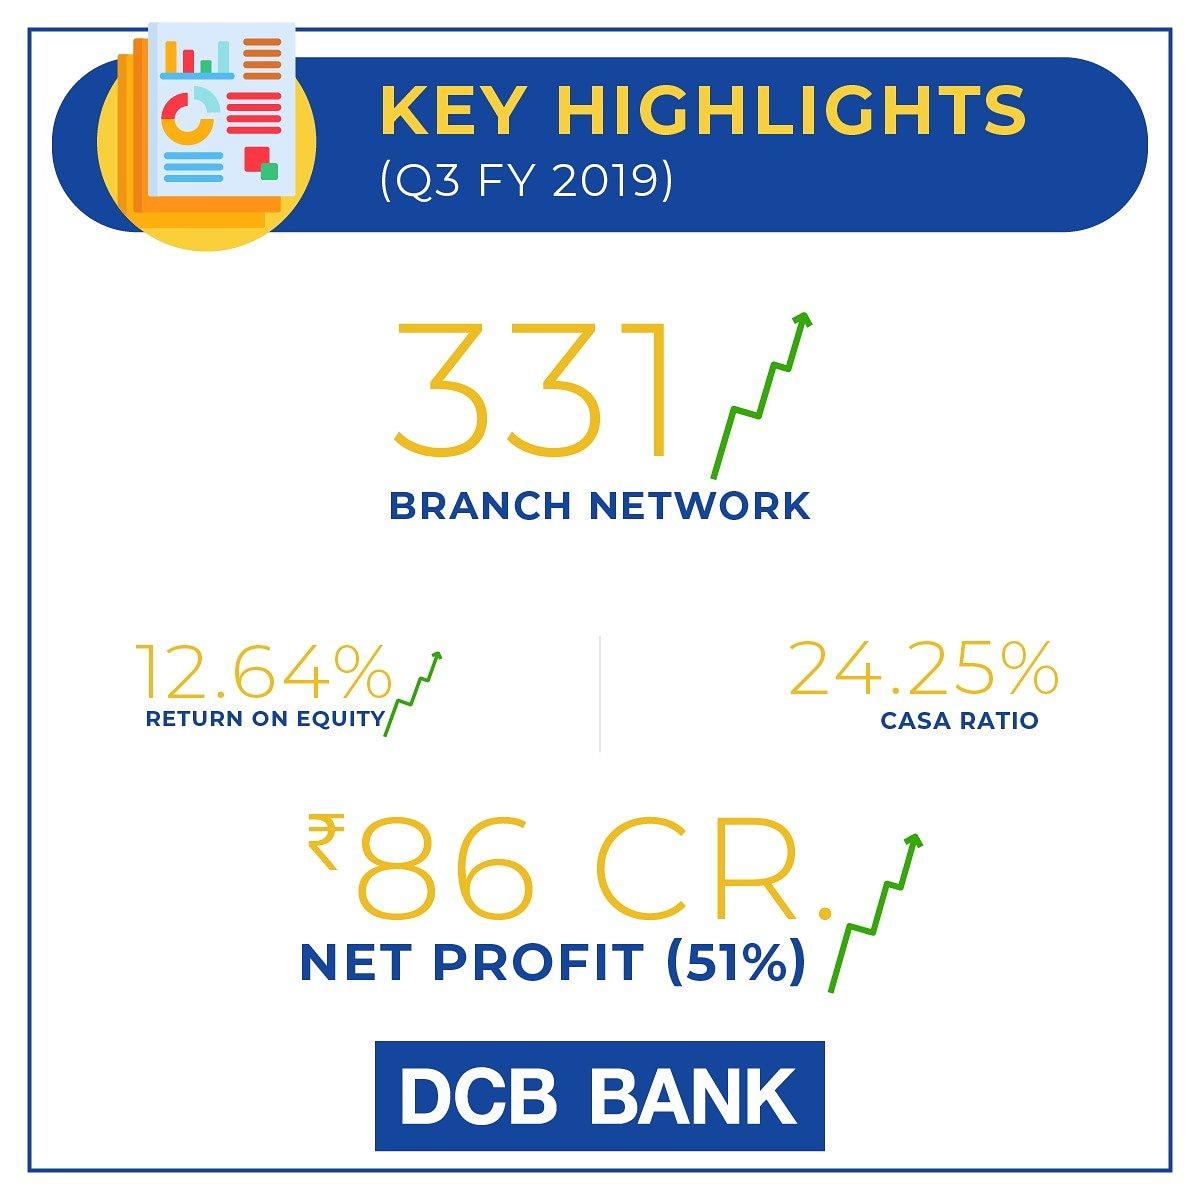 DCB Bank (@DCBBank) | Twitter